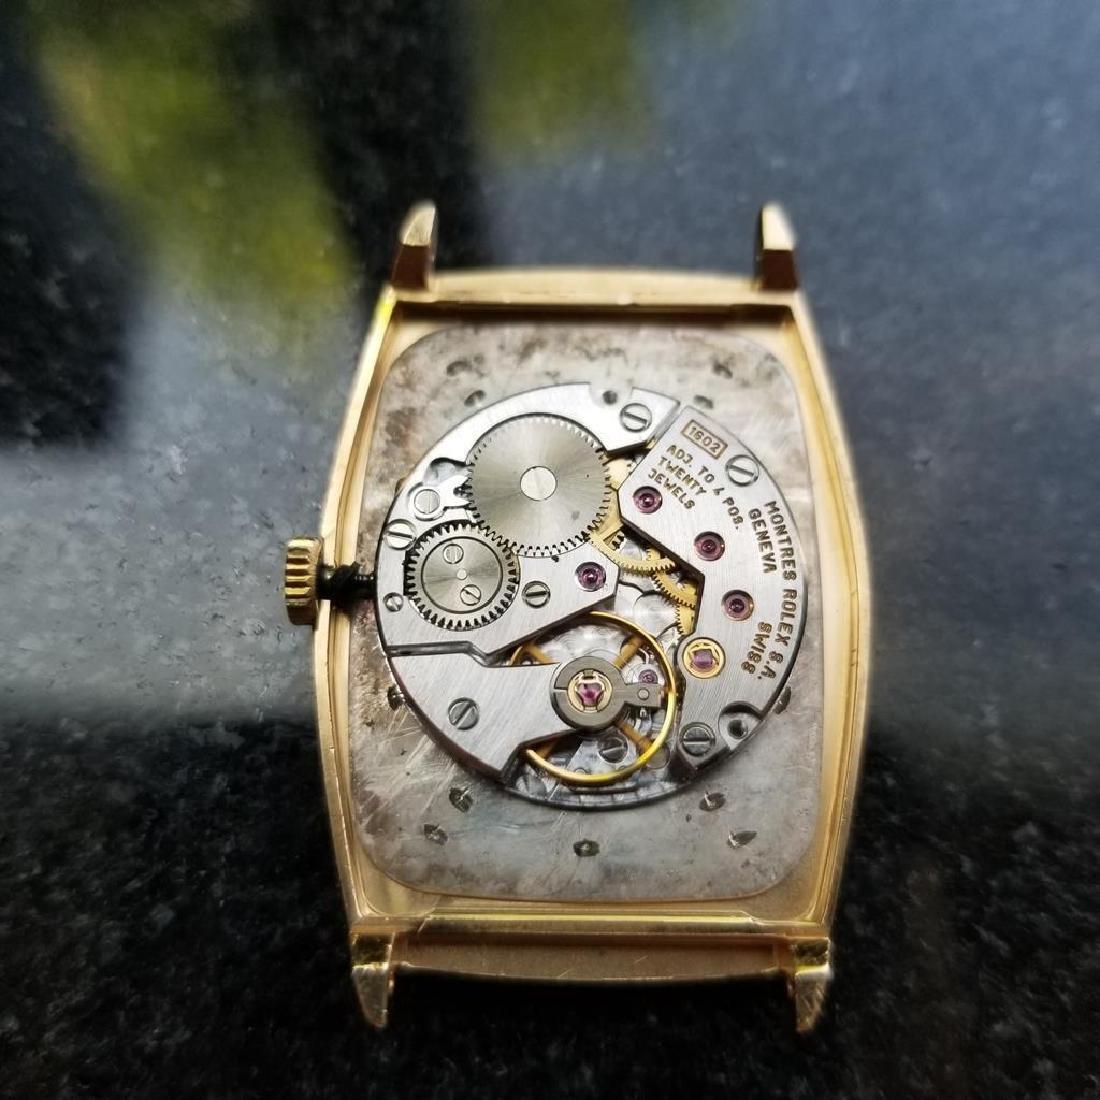 ROLEX Men's 18K Gold Cellini 4136 Hand-Wind Dress Watch - 8